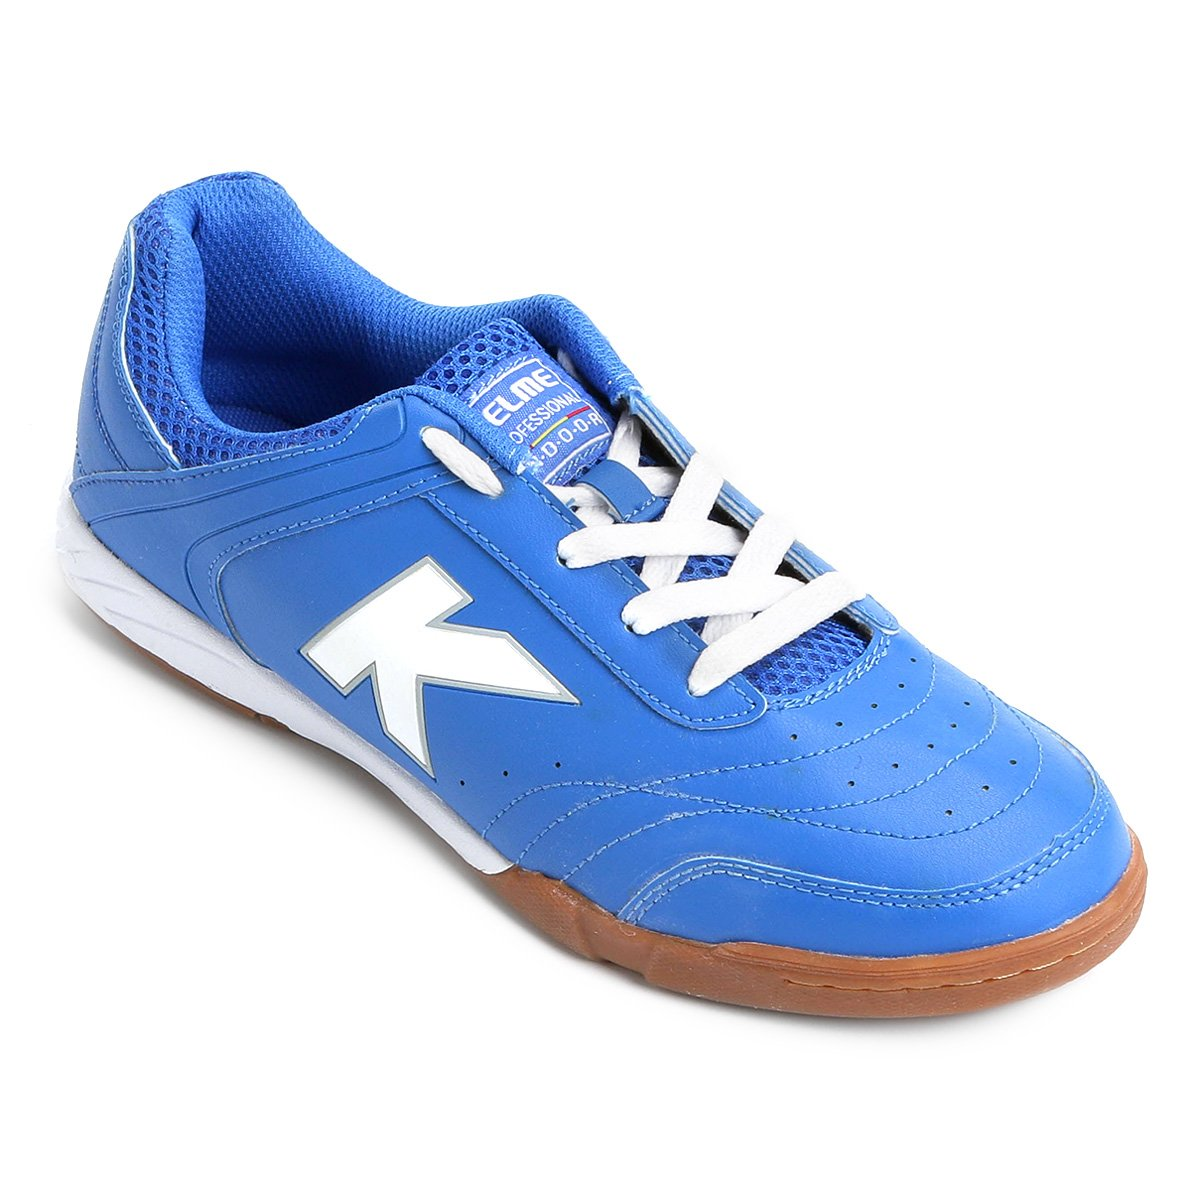 Branco Masculina Chuteira Kelme Precision Azul e Trn Chuteira Futsal Futsal  YqxzFz ... c1faef75035e7